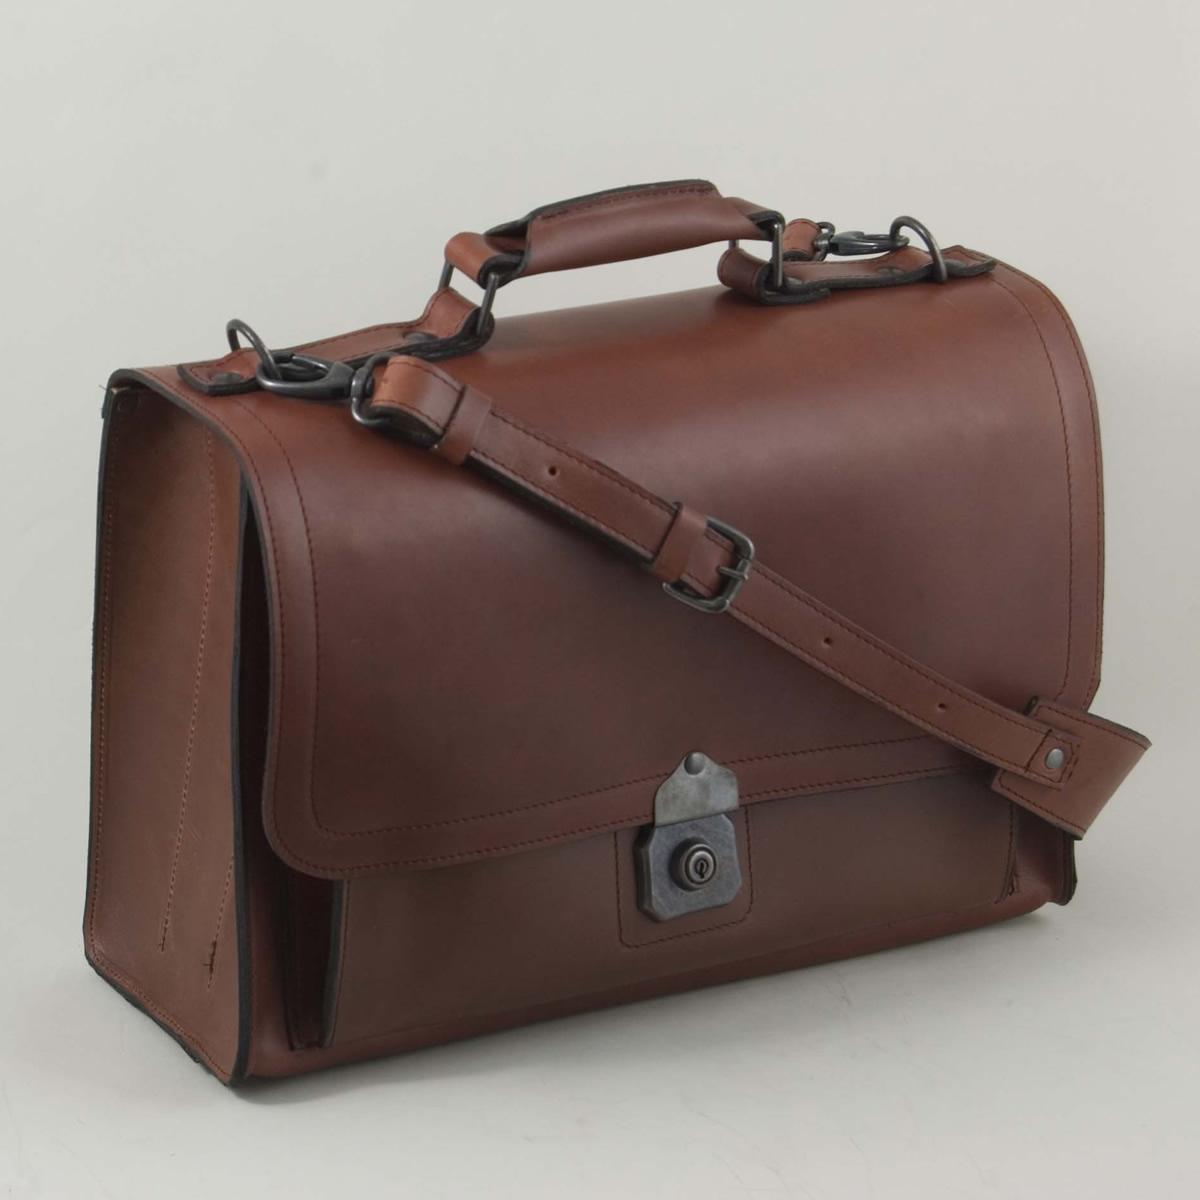 Handmade Leather Briefcase Satchel Henry Tomkins